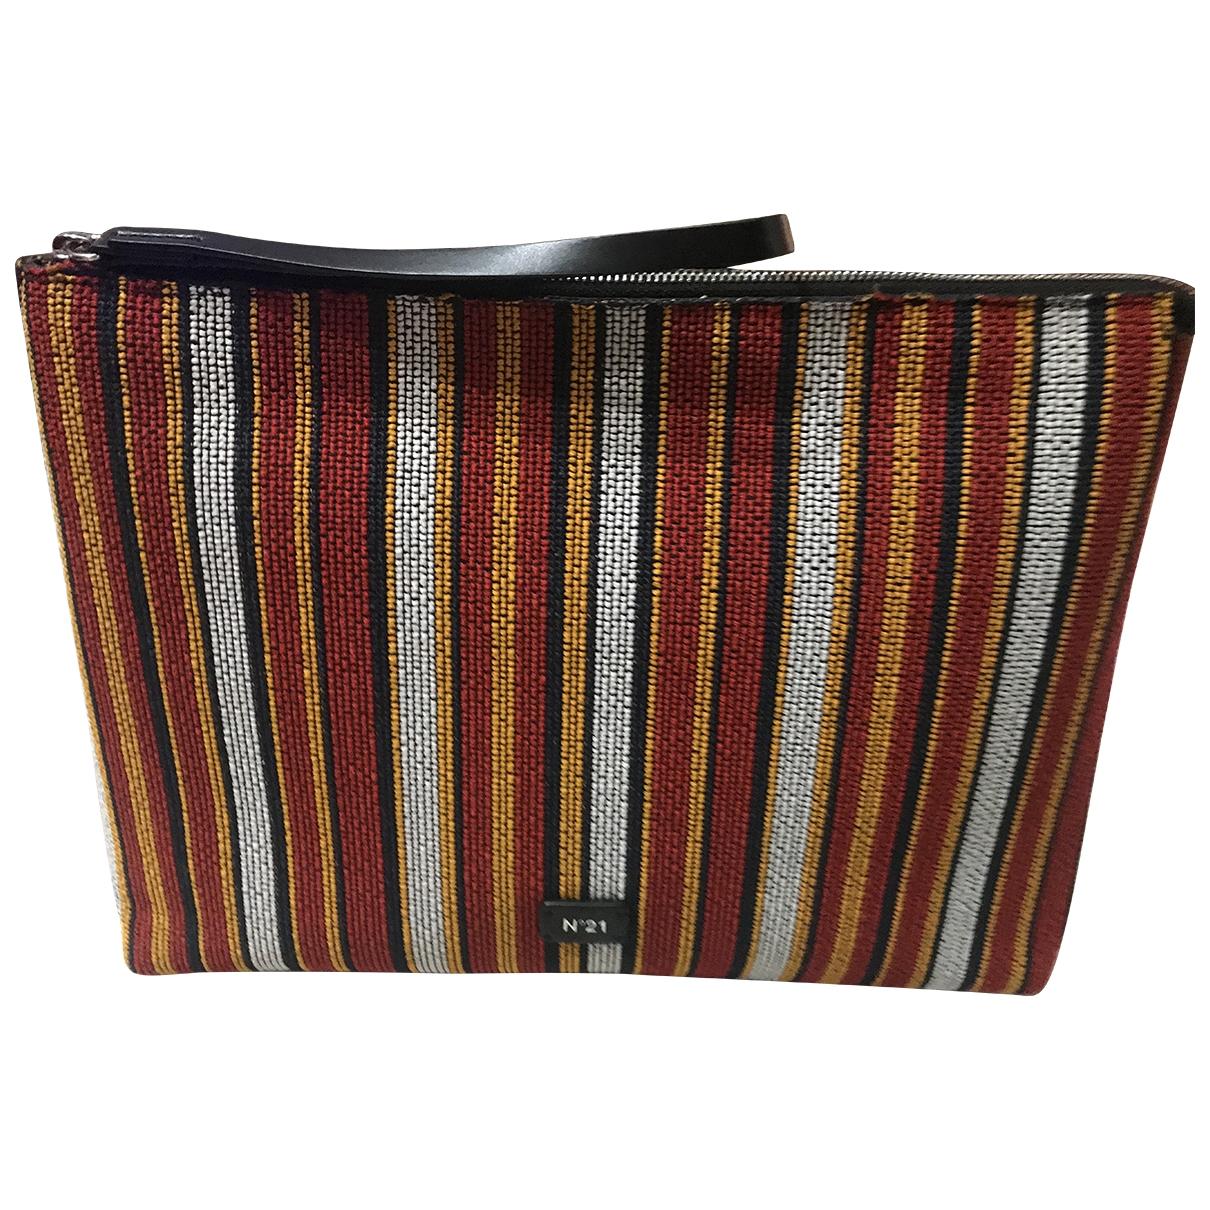 N°21 \N Multicolour Cloth Clutch bag for Women \N